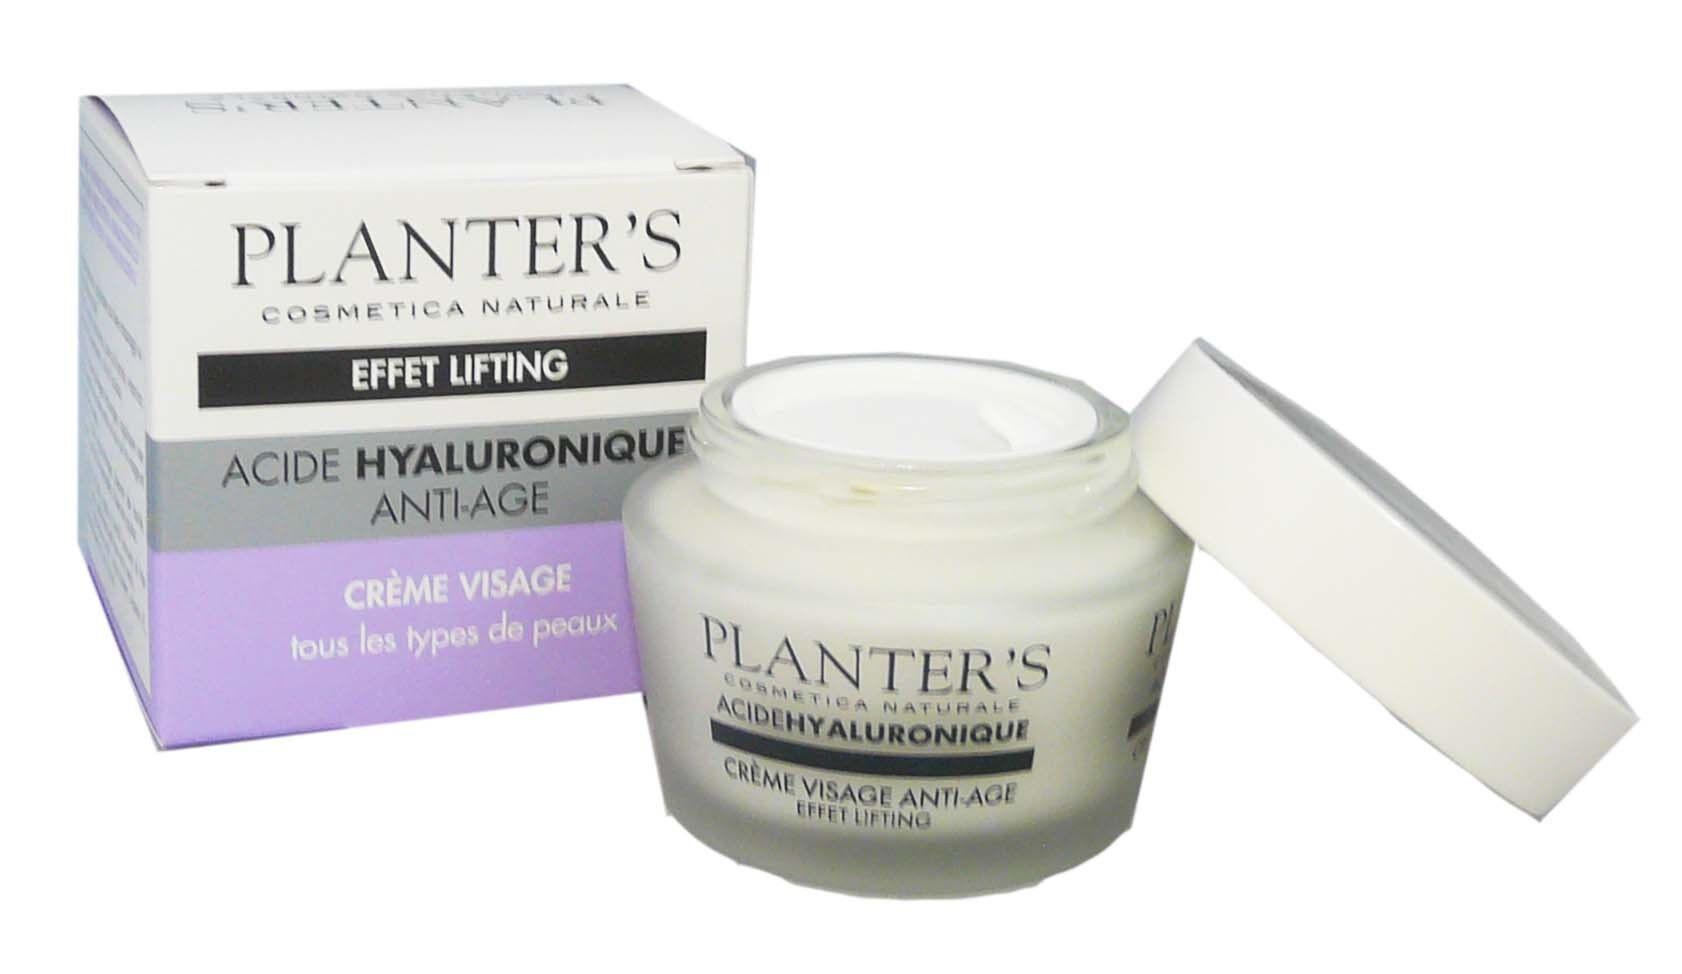 Planter's effet lifting acide hyaluronique 50ml